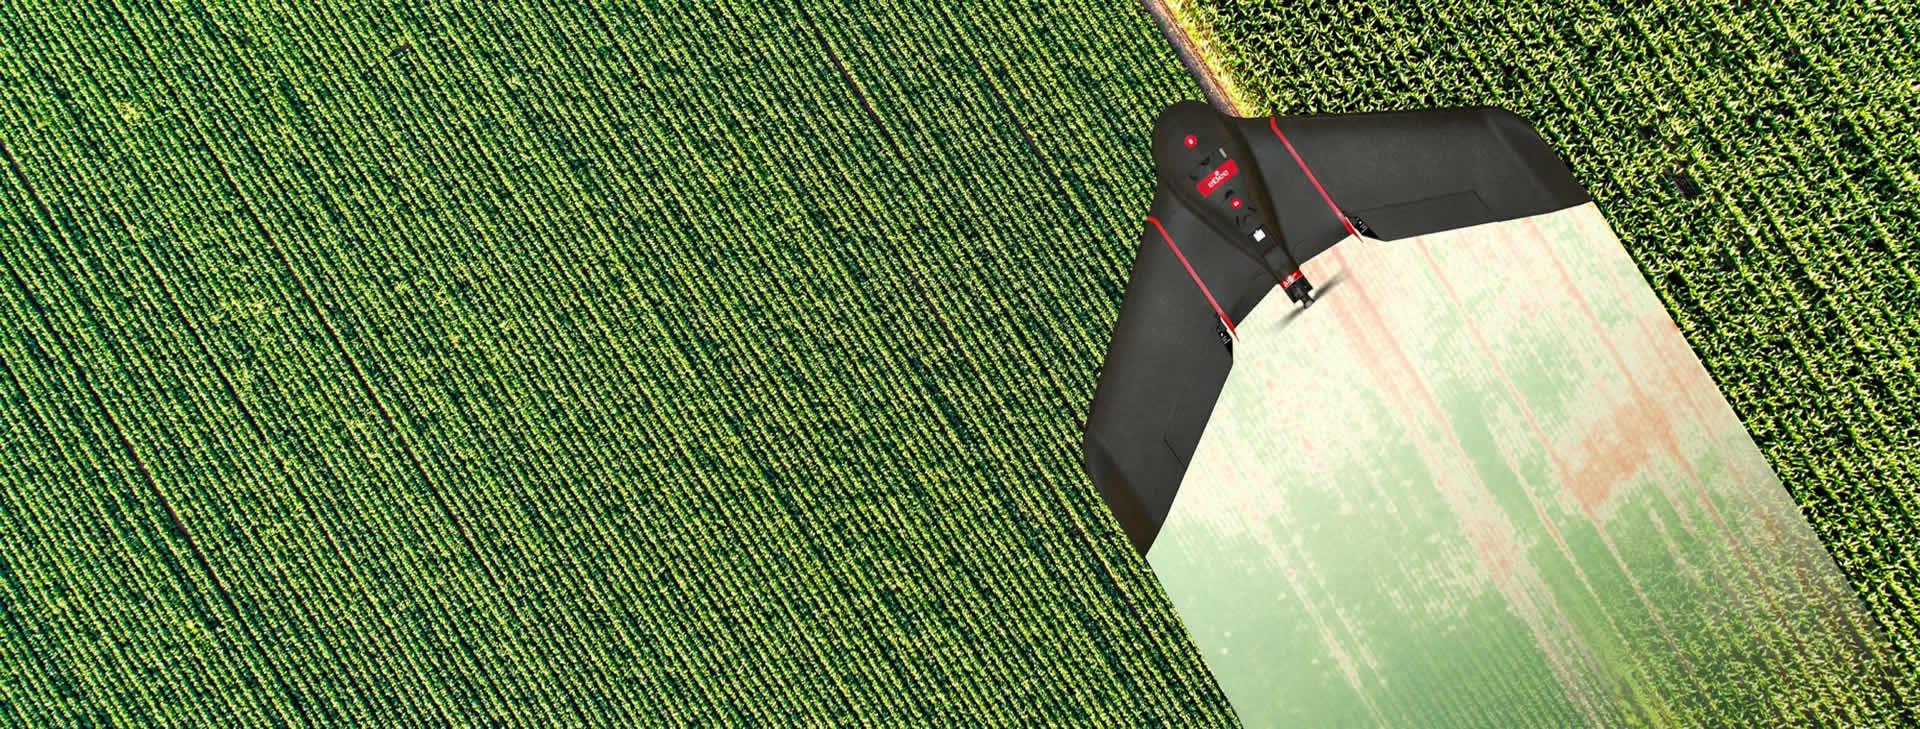 Yποδομή και εξοπλισμός για ανάληψη <br /> έργων γεωργίας ακριβείας